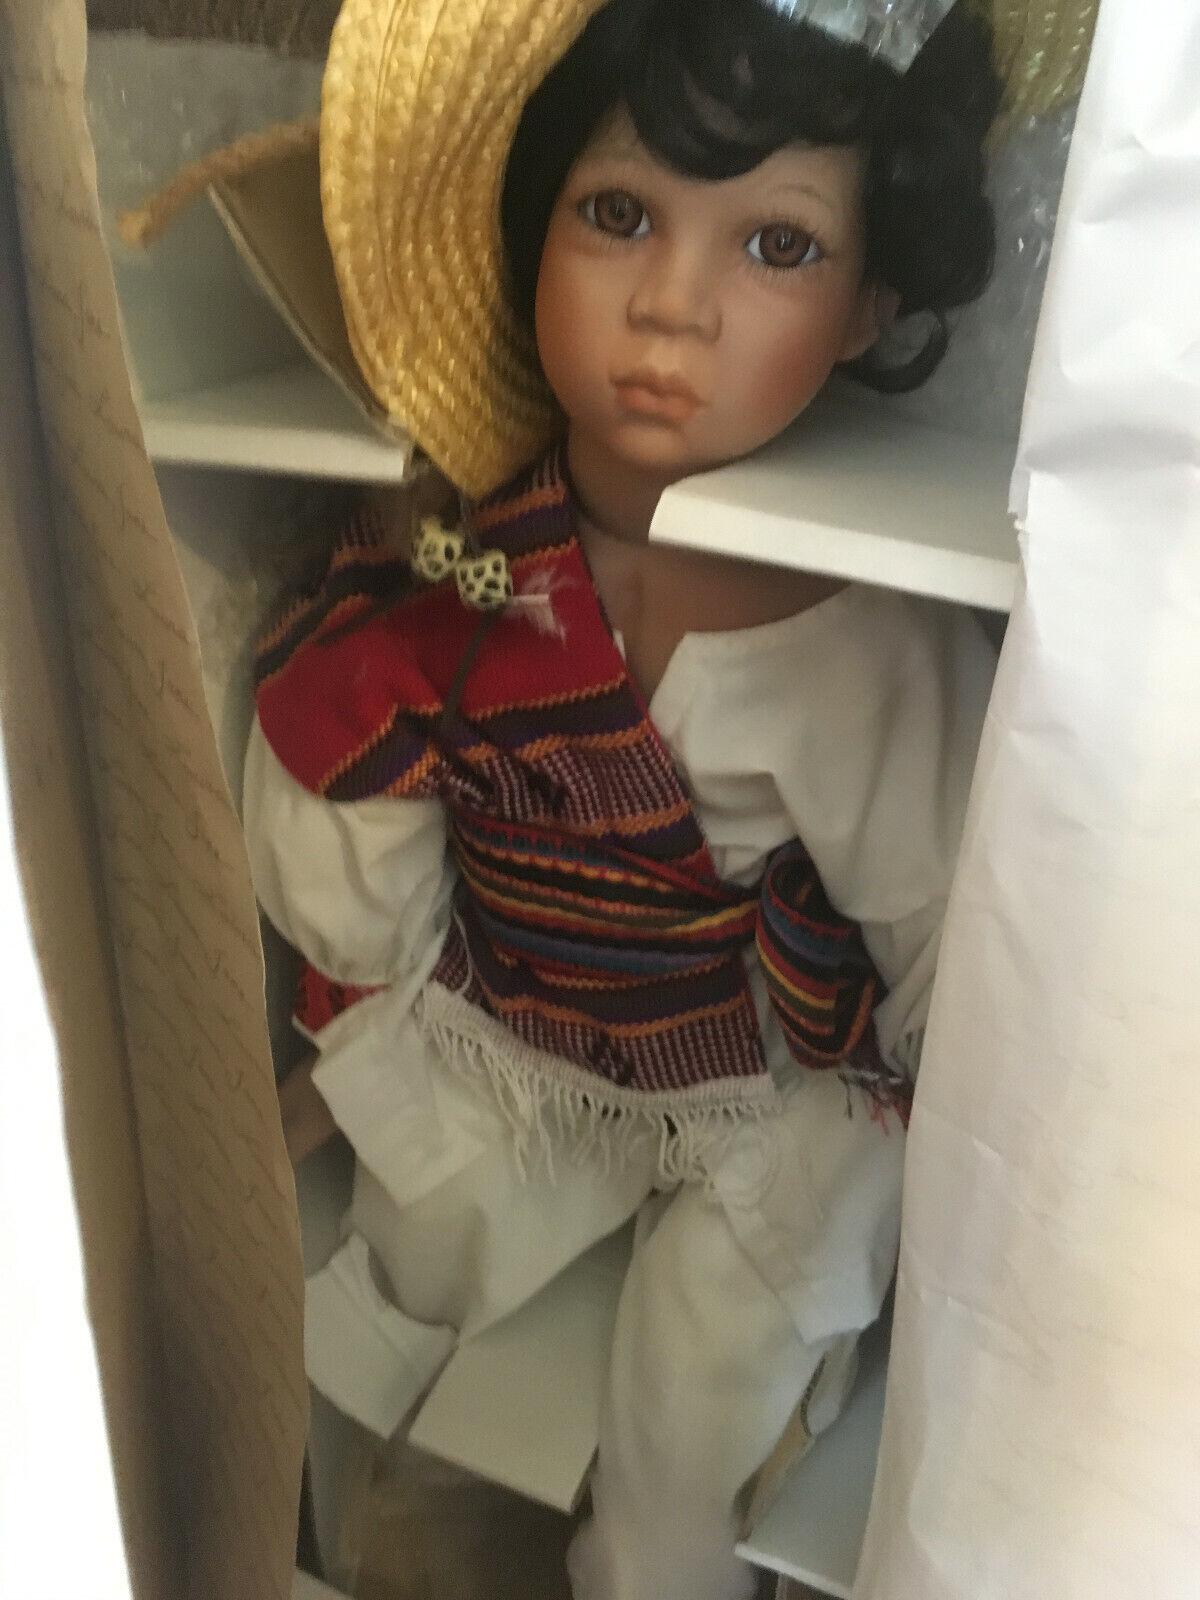 Rare WORLD GALLERY Hispanic Boy Pepito PORCELAIN DOLL BY Laura Jane lmtd 1,500